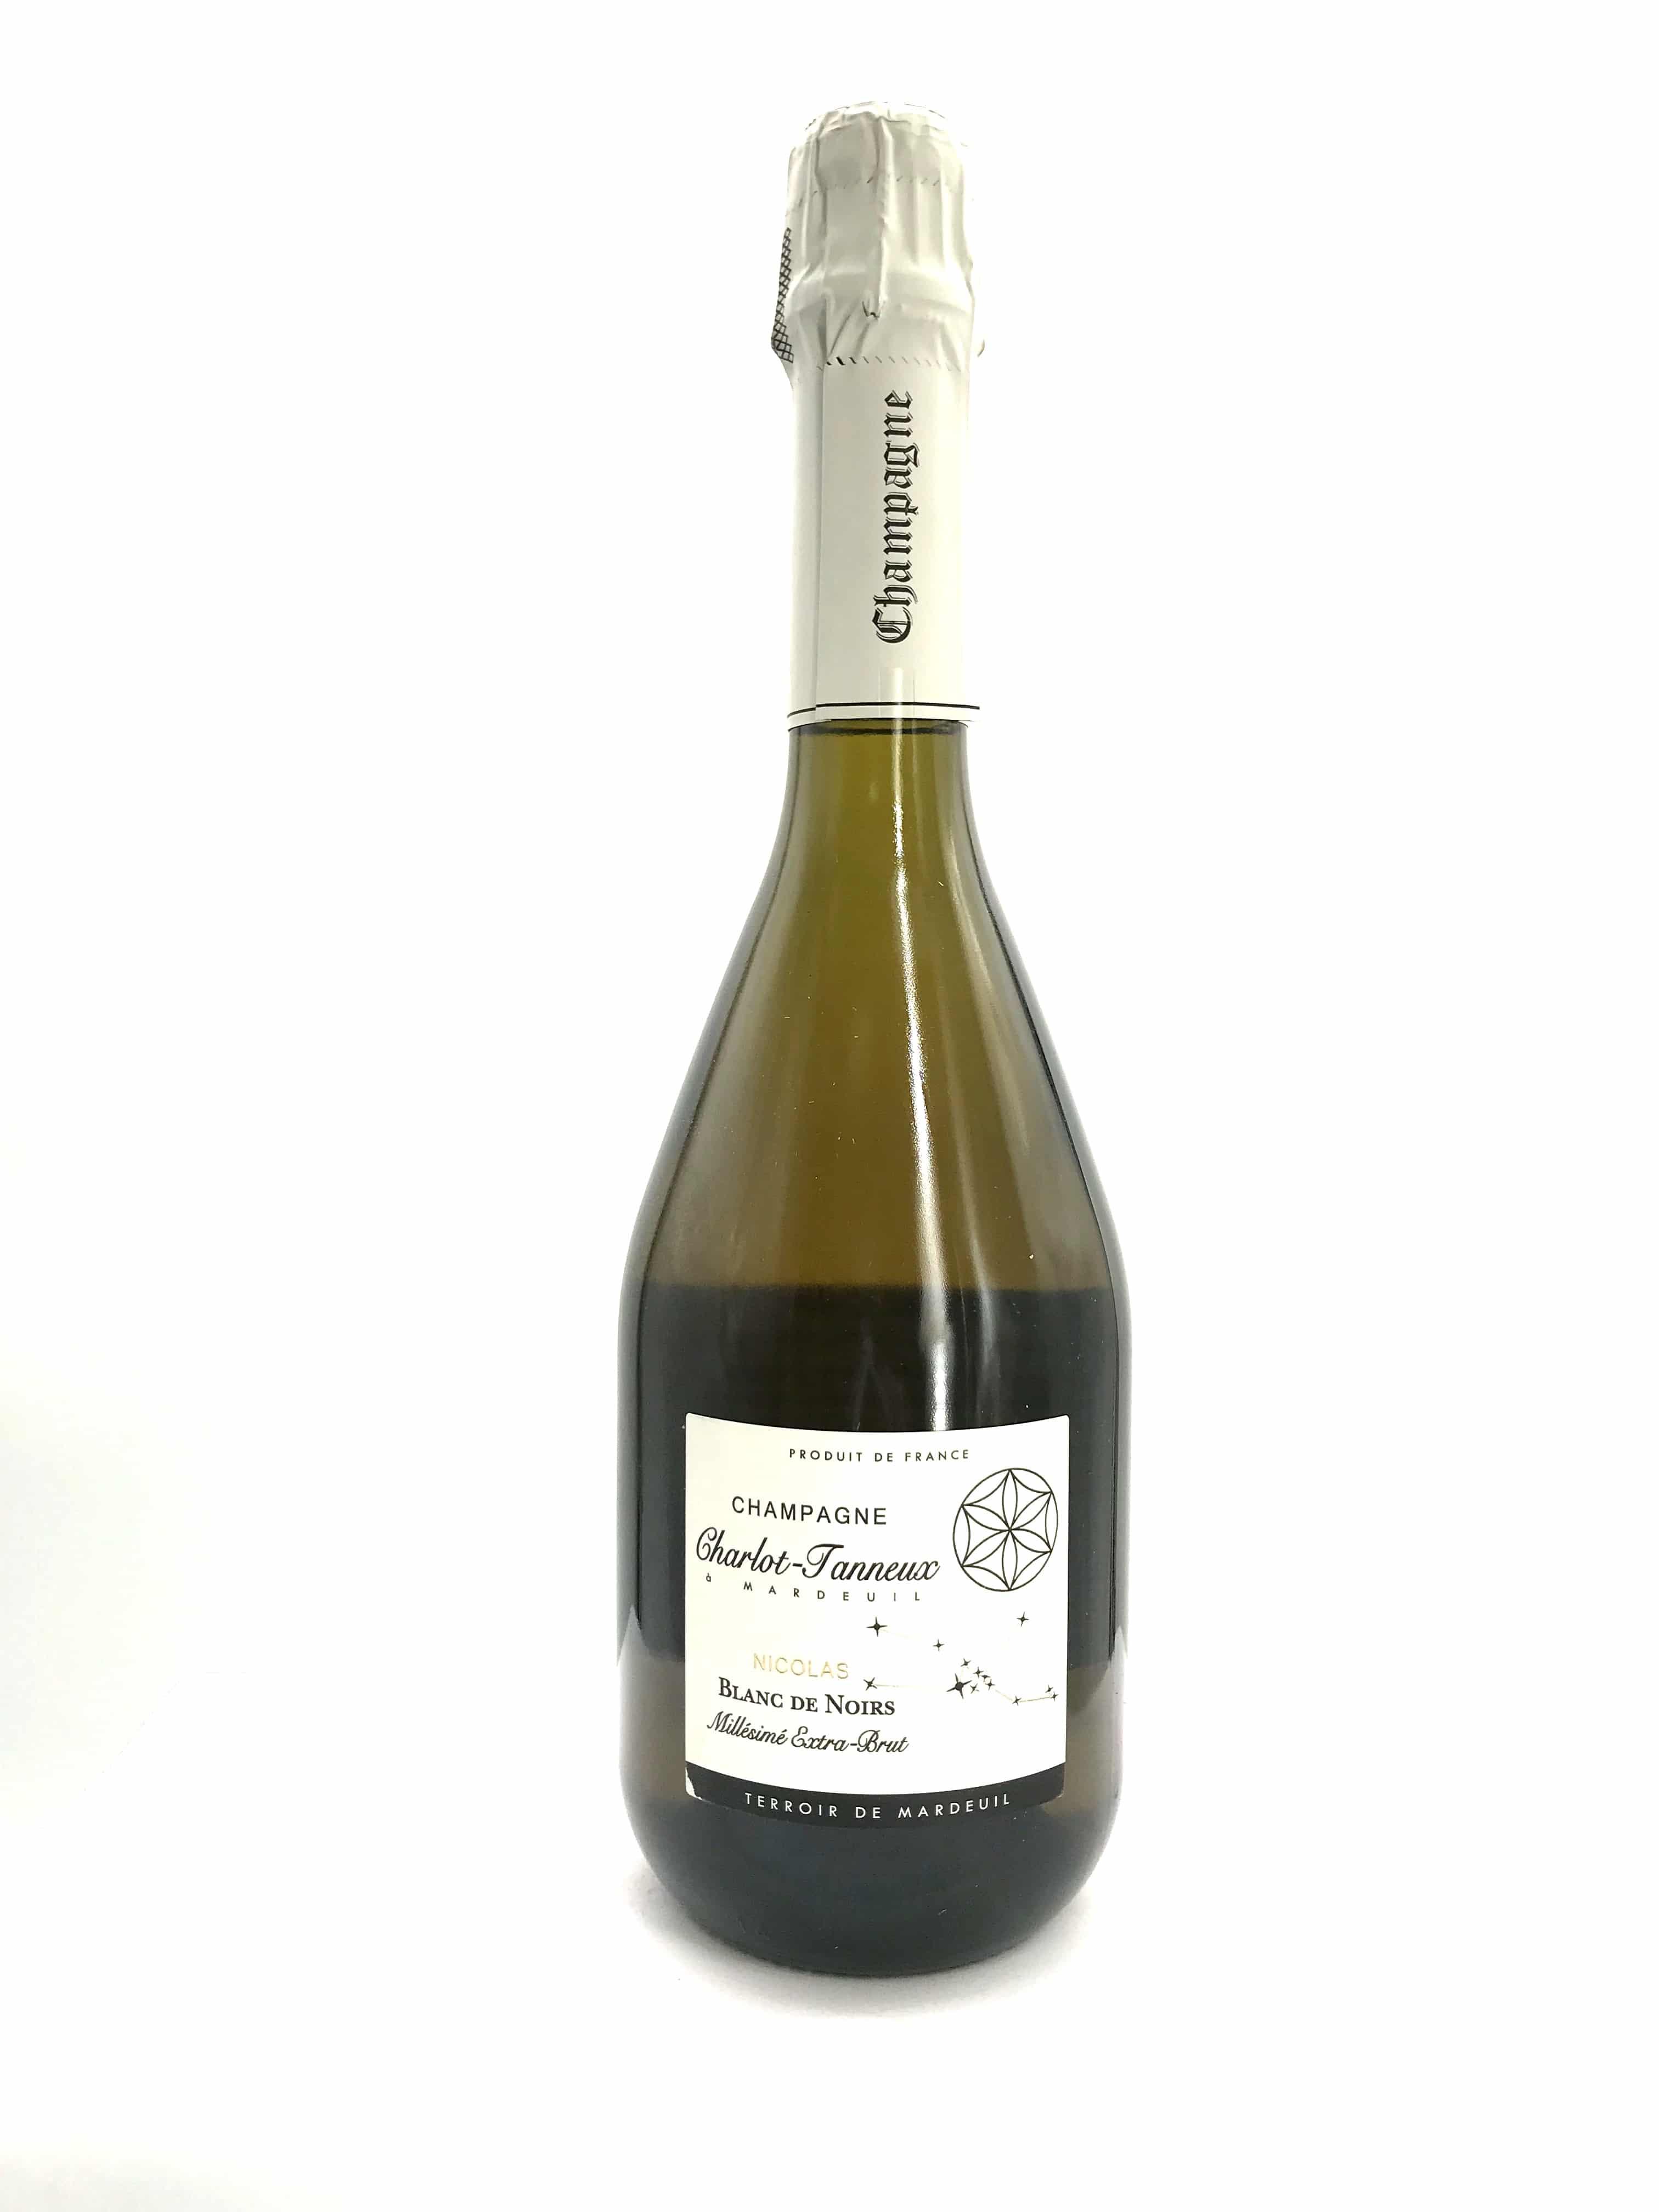 Champagne Charlot Tanneux Cuvee Nicolas Premier Cru